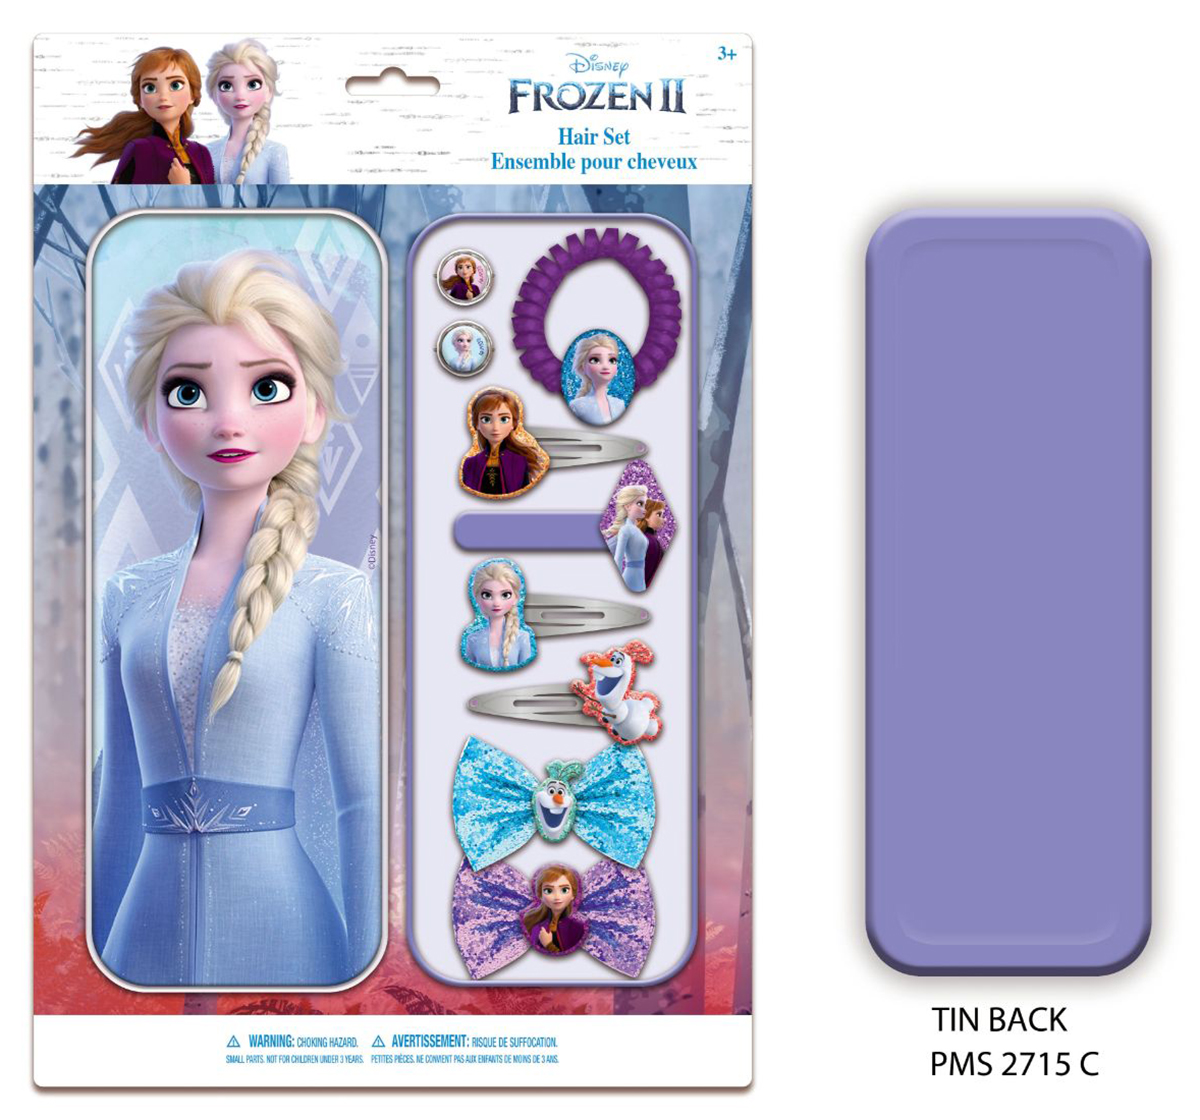 Townley Girl   NE Disney Frozen Hair Accessories in Tin for Girls age 5Y+